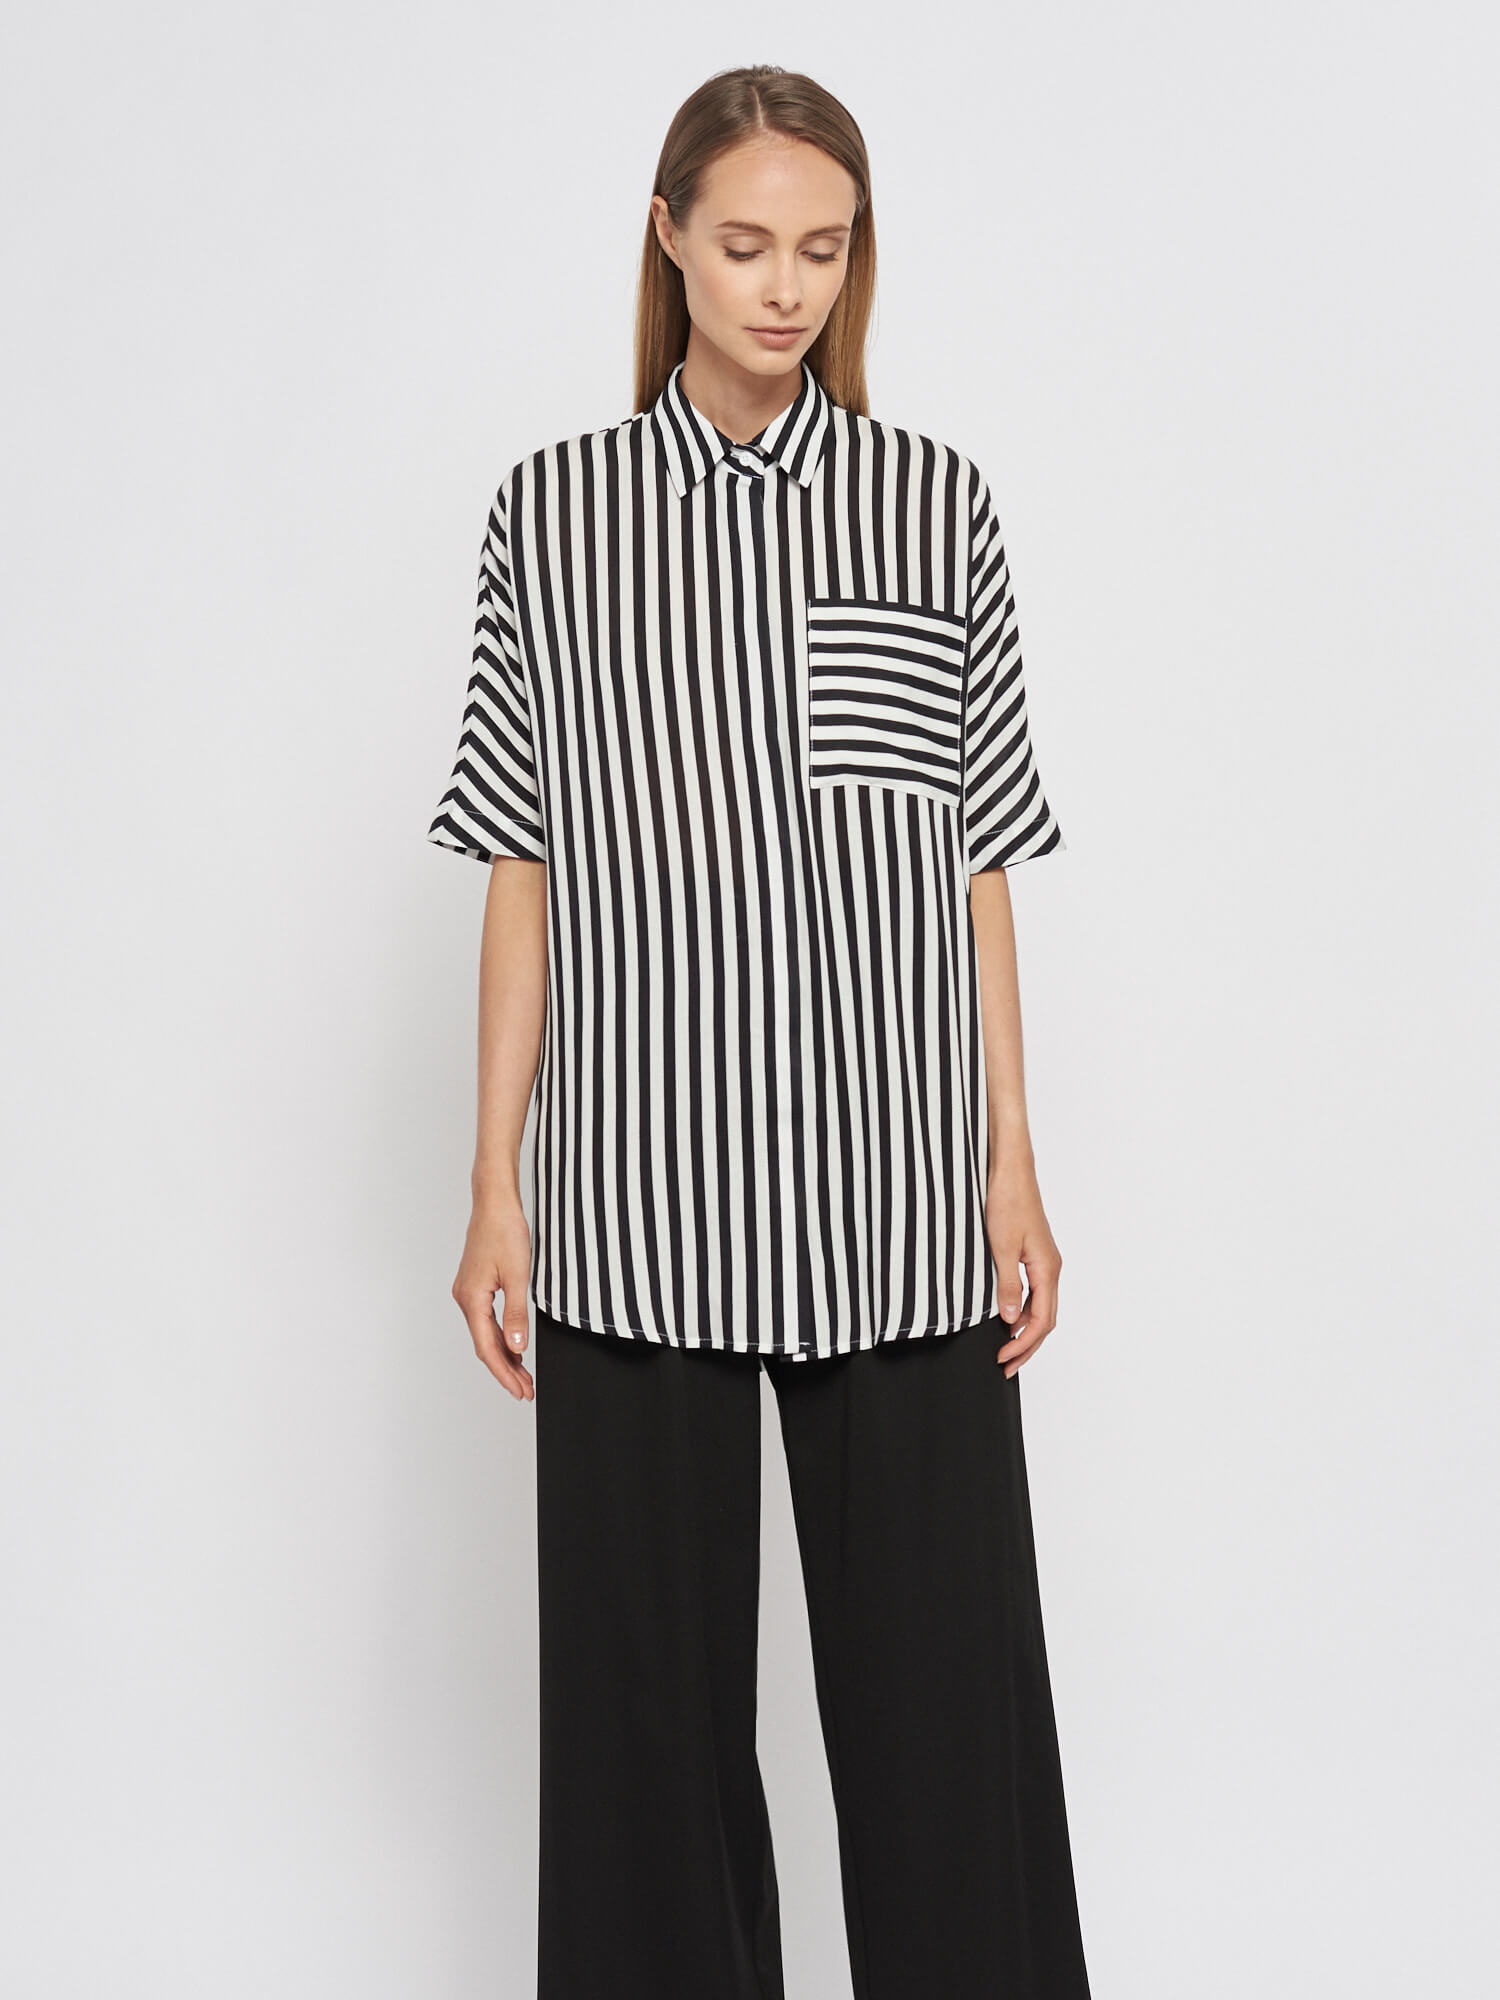 Рубашка Gemma c кольцами на поясе фото